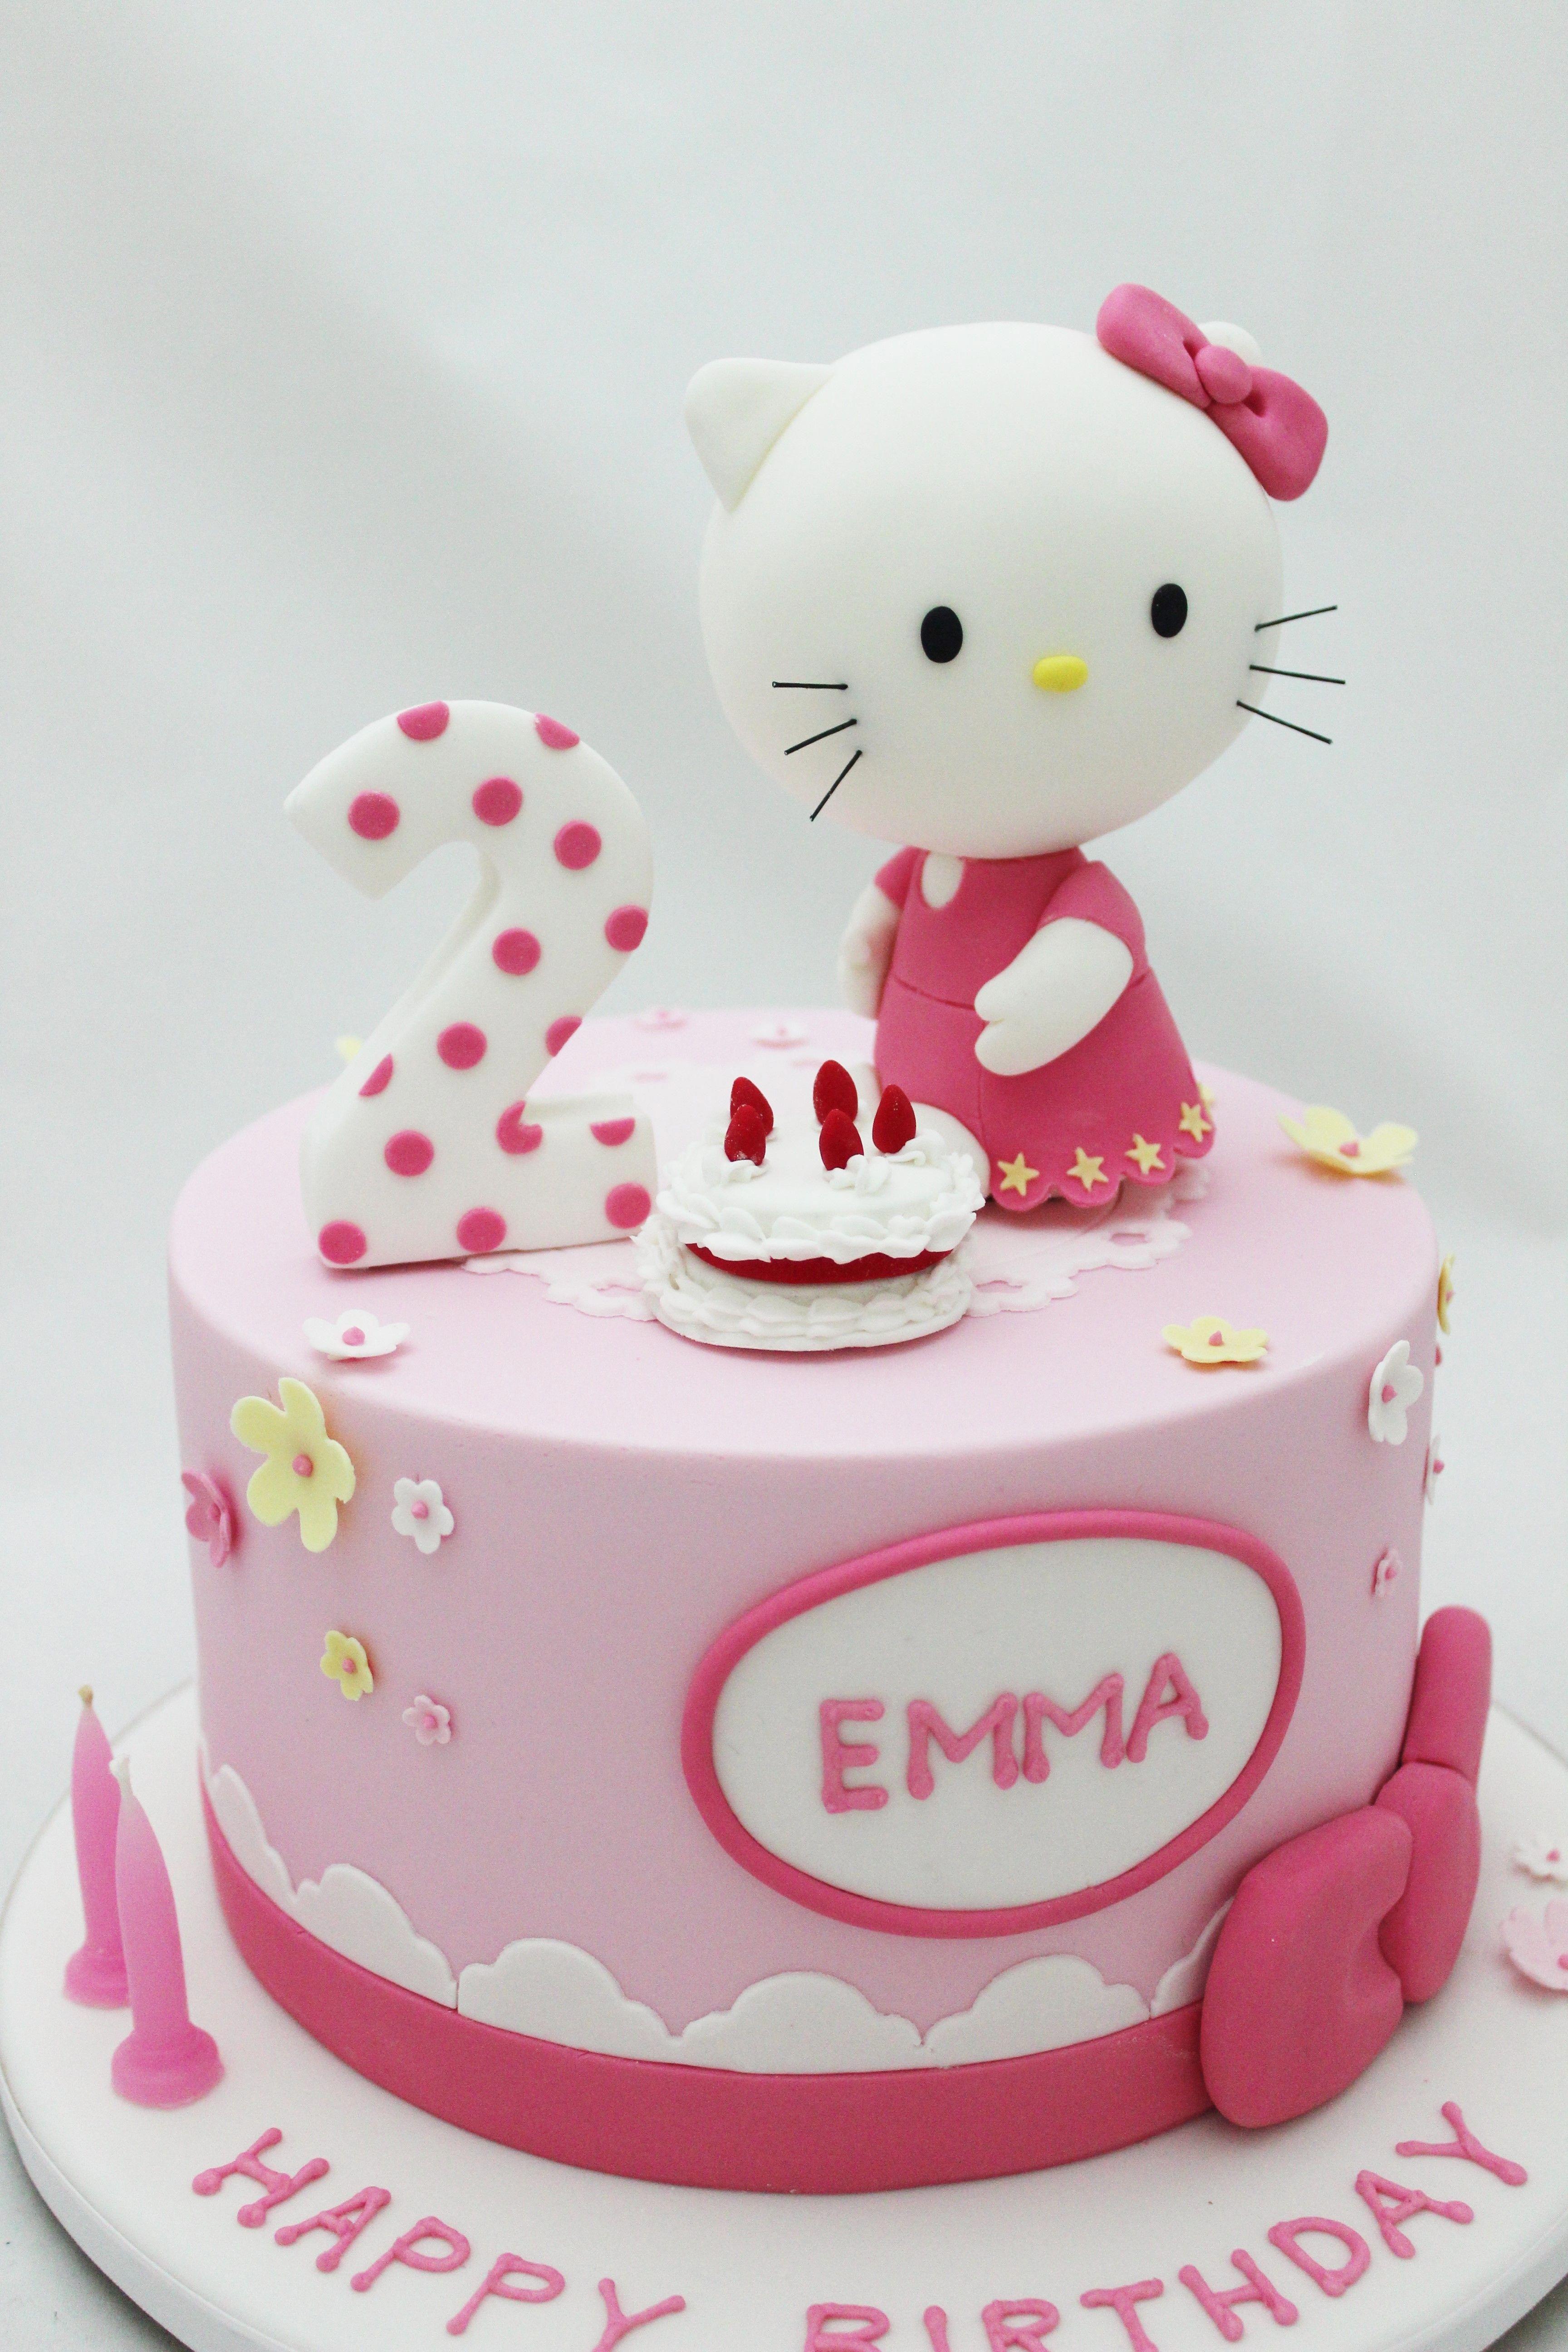 Hello Kitty Cake For 2nd Girl S Birthday Fondantcake Dengan Gambar Ulang Tahun Kue Ulang Tahun Kue